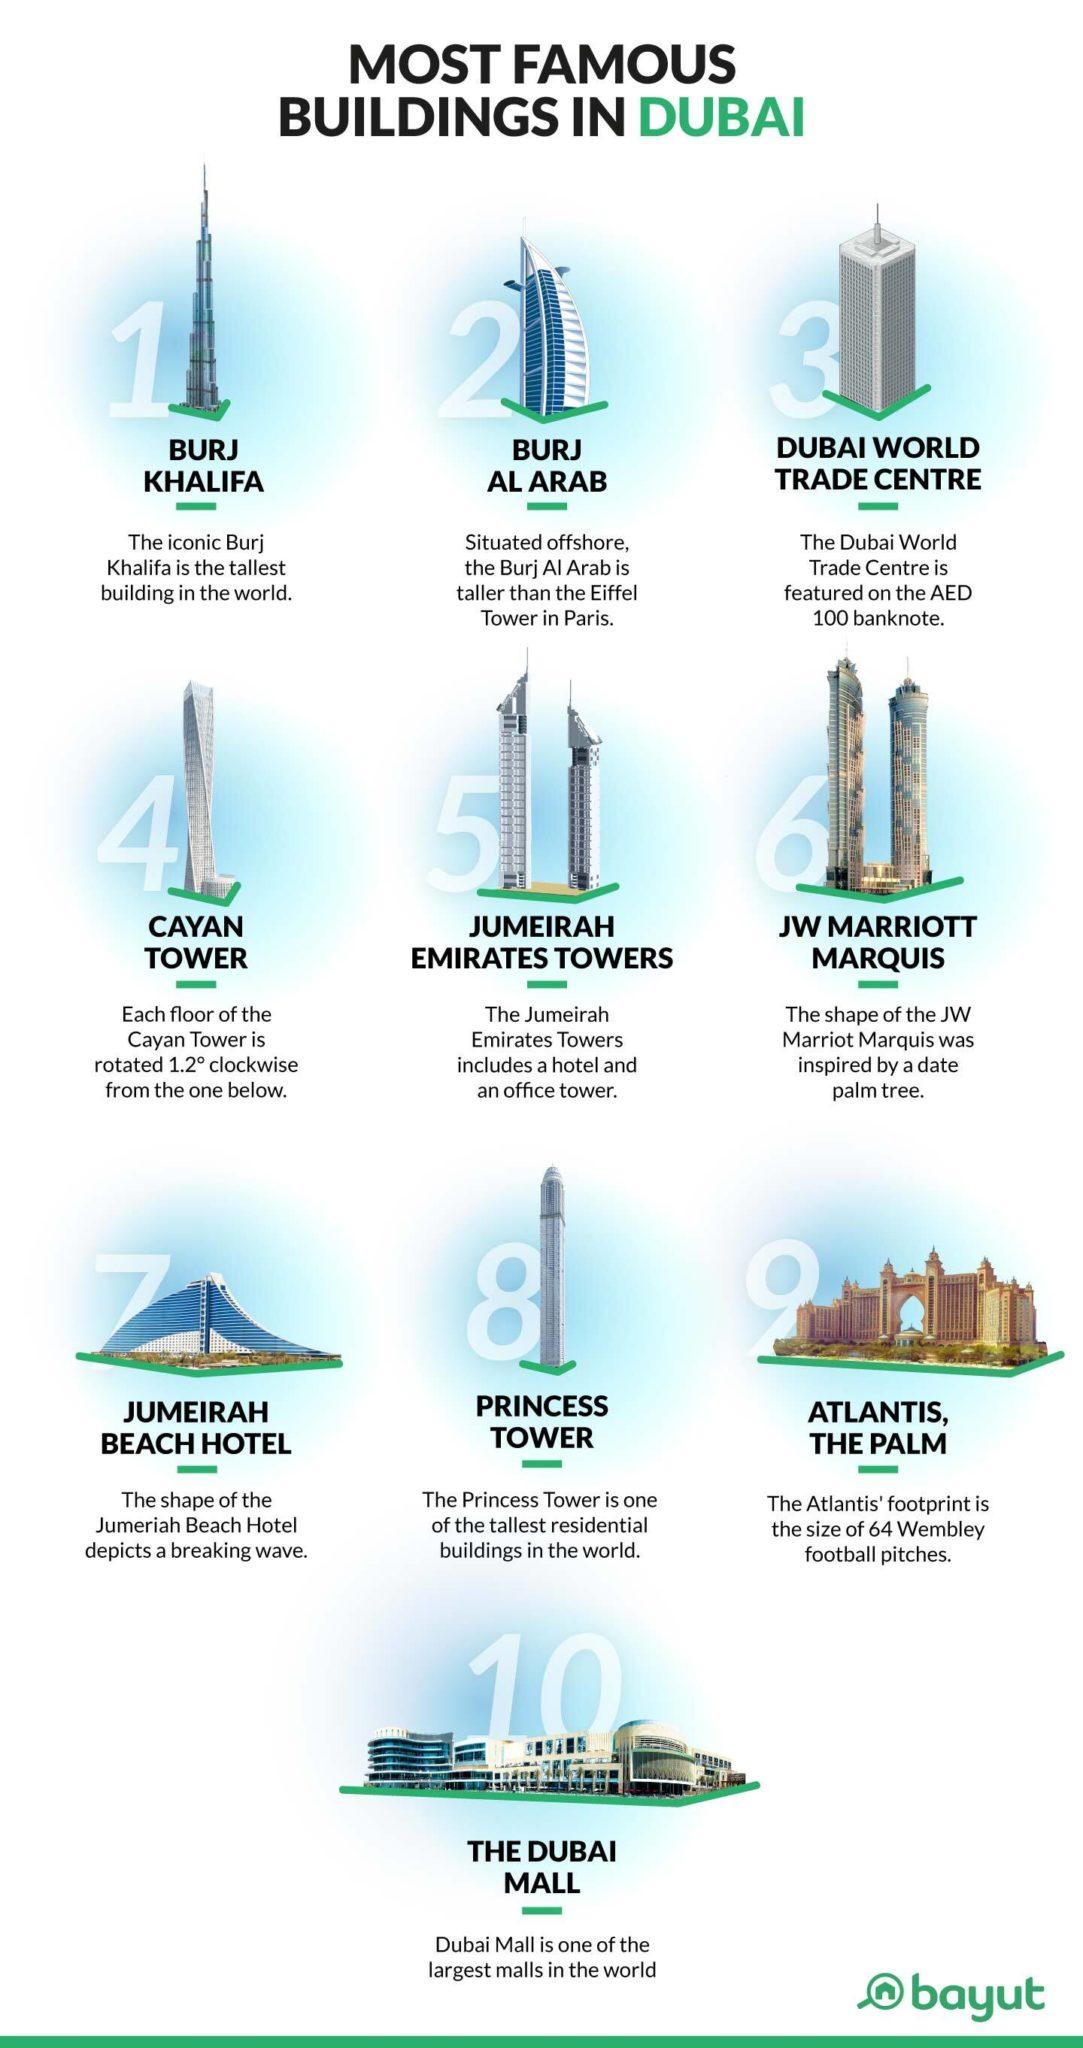 Famous Buildings in Dubai